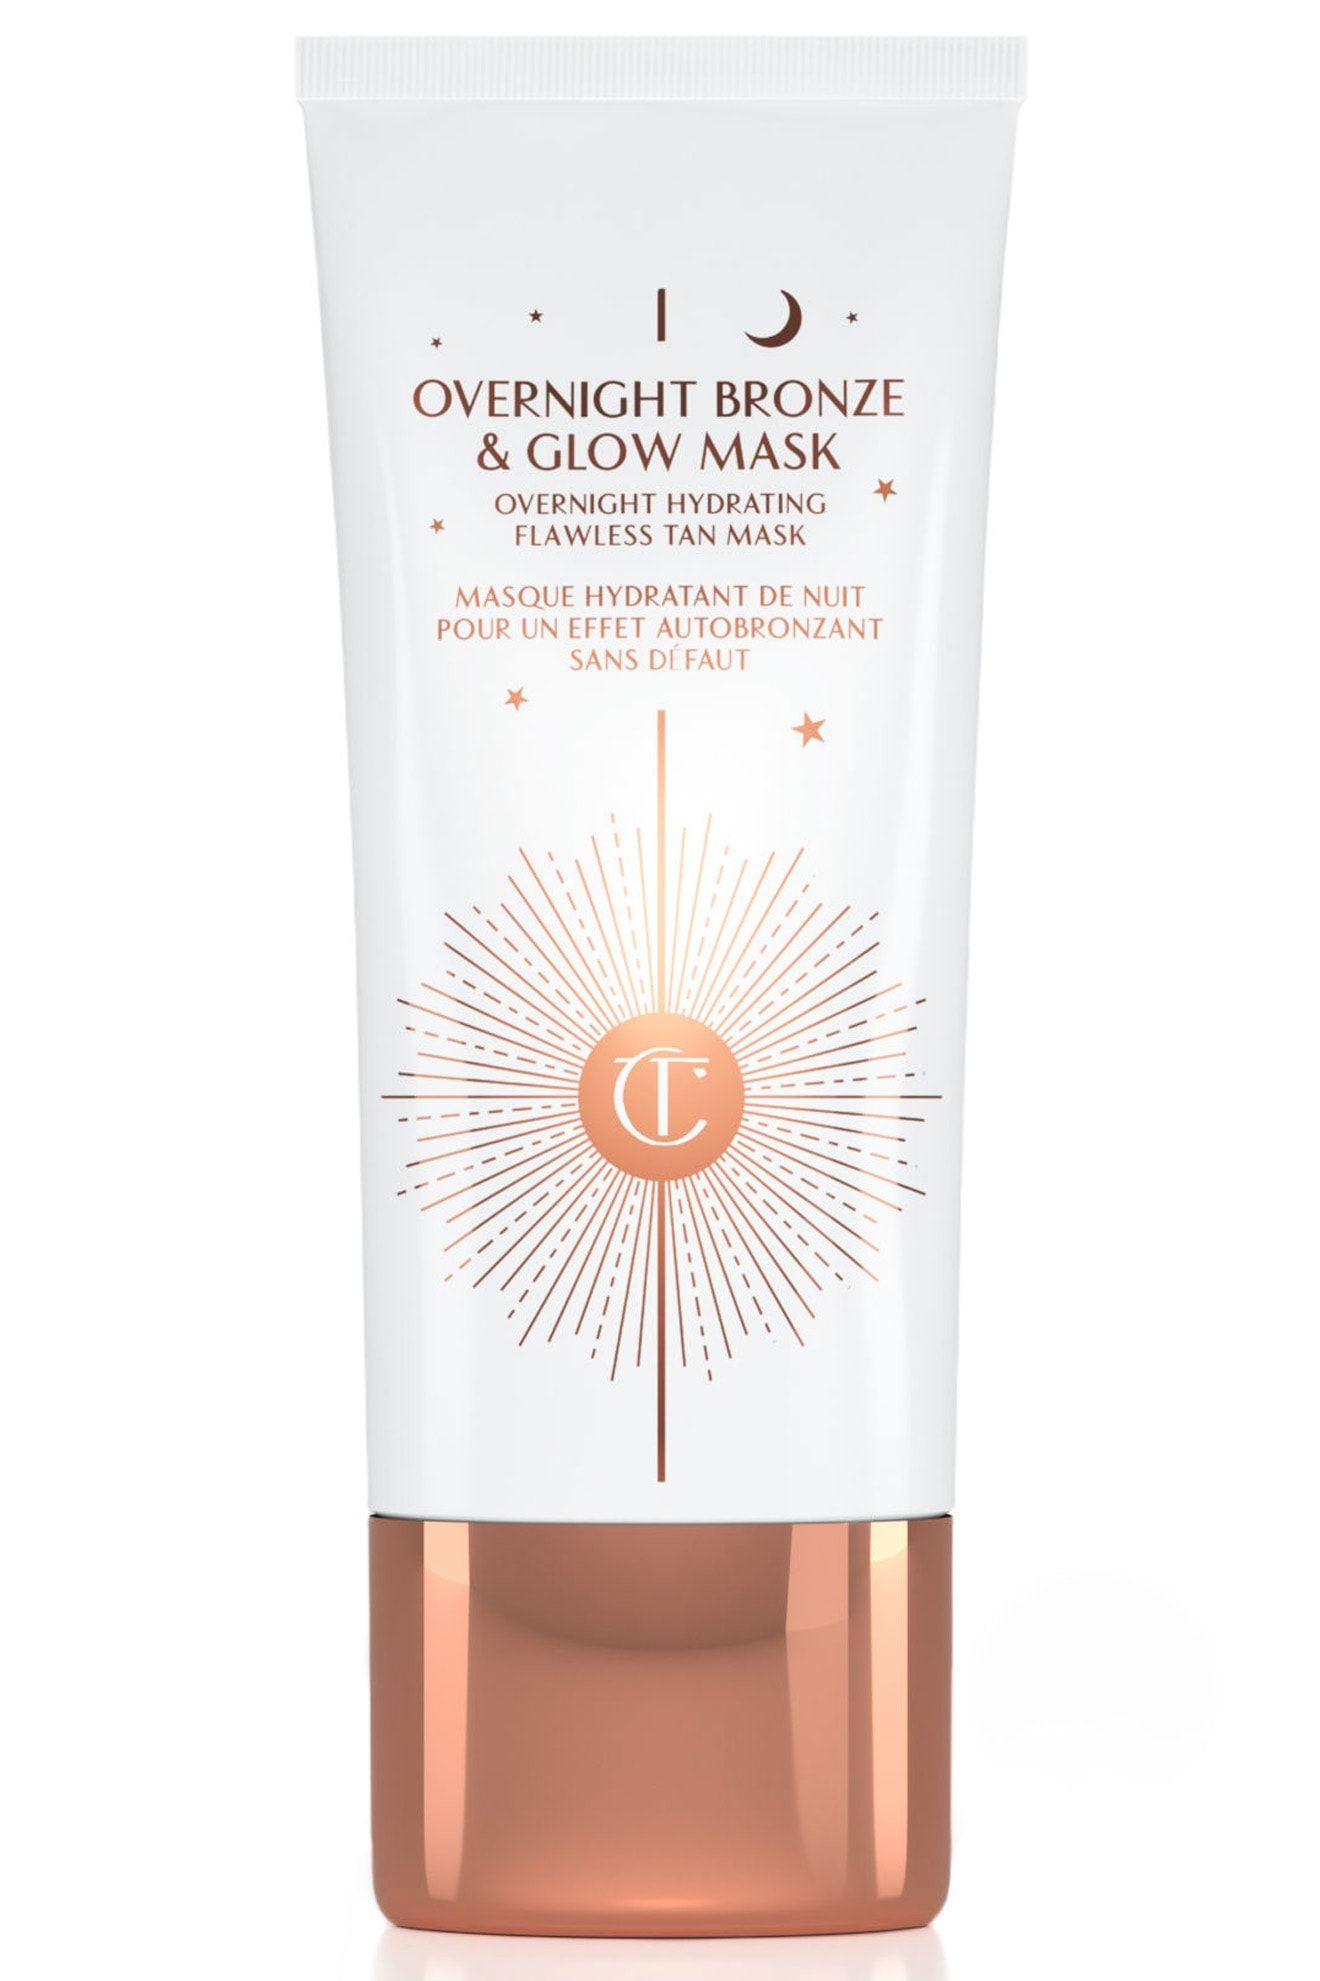 Overnight Bronze & Glow Mask